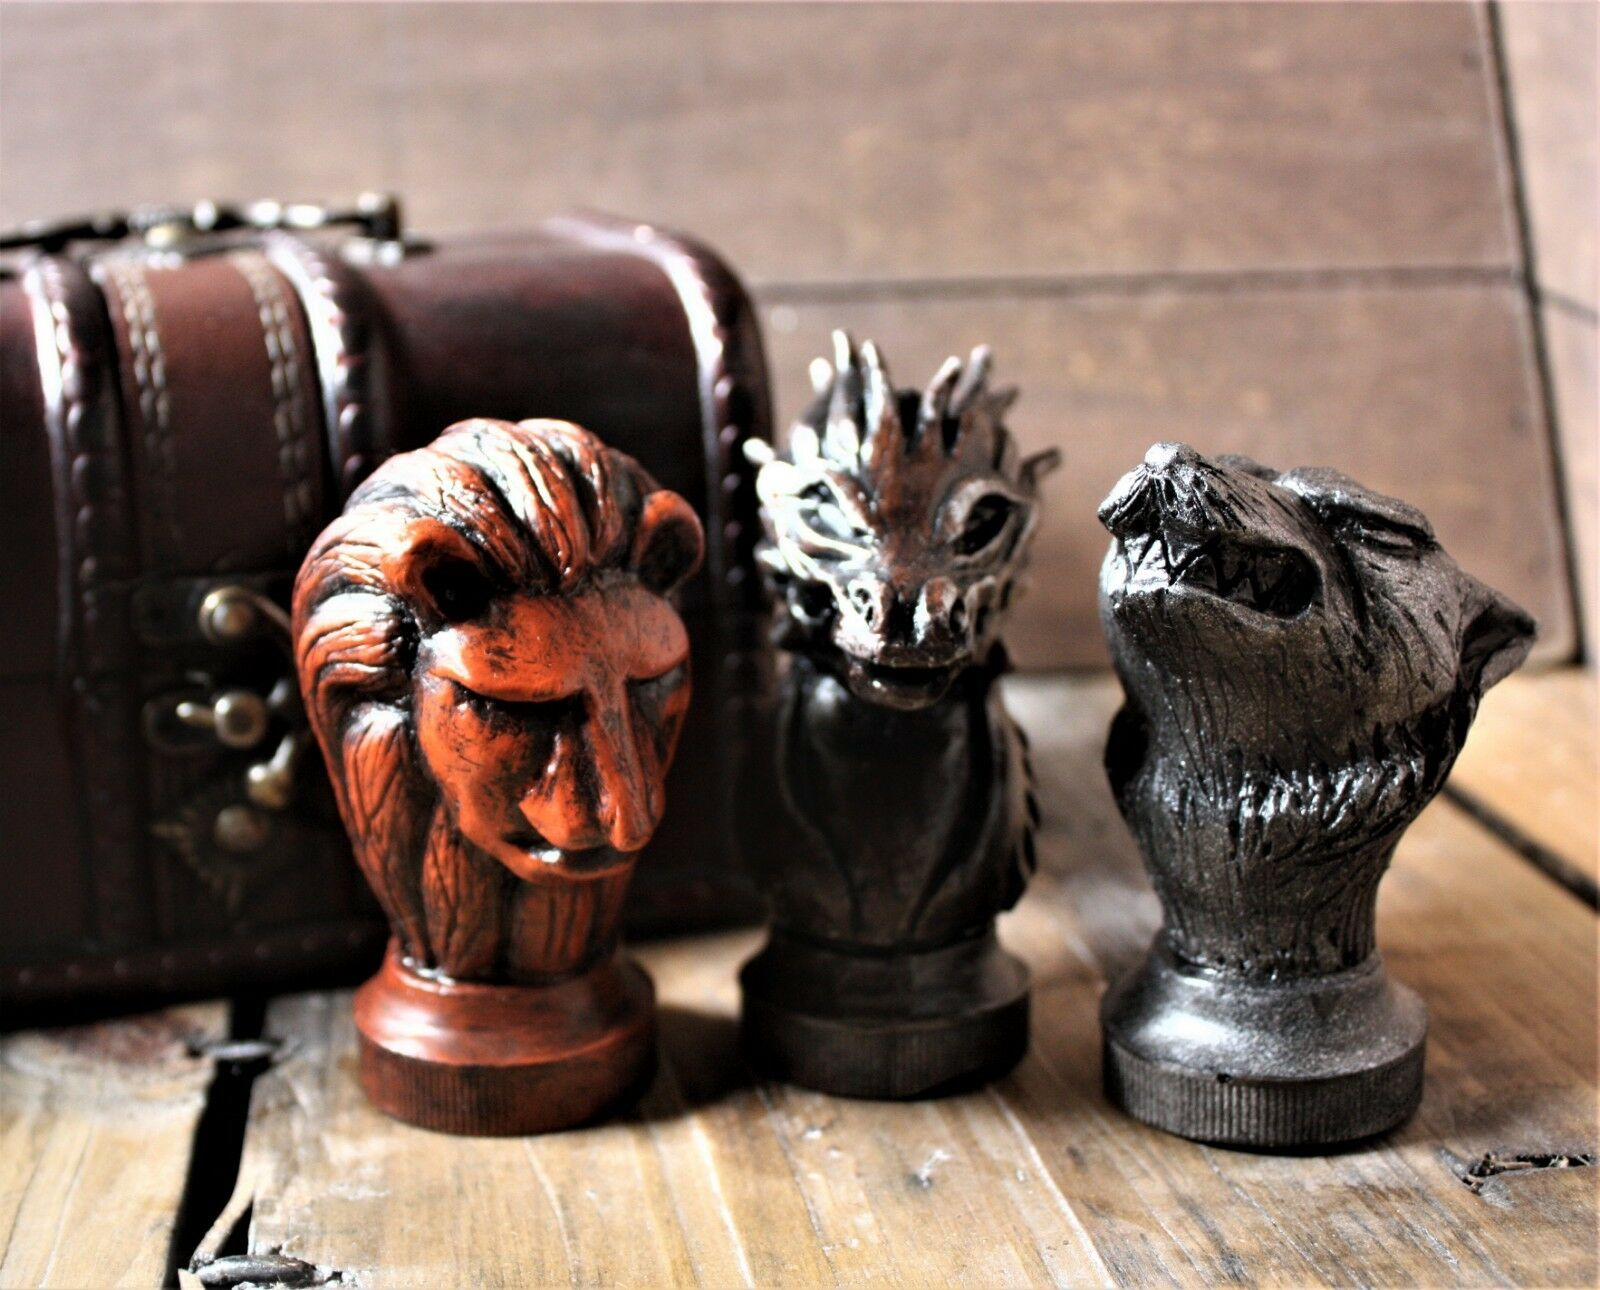 Game of thrones karte marker gesetzt, targeryen stark lannister,